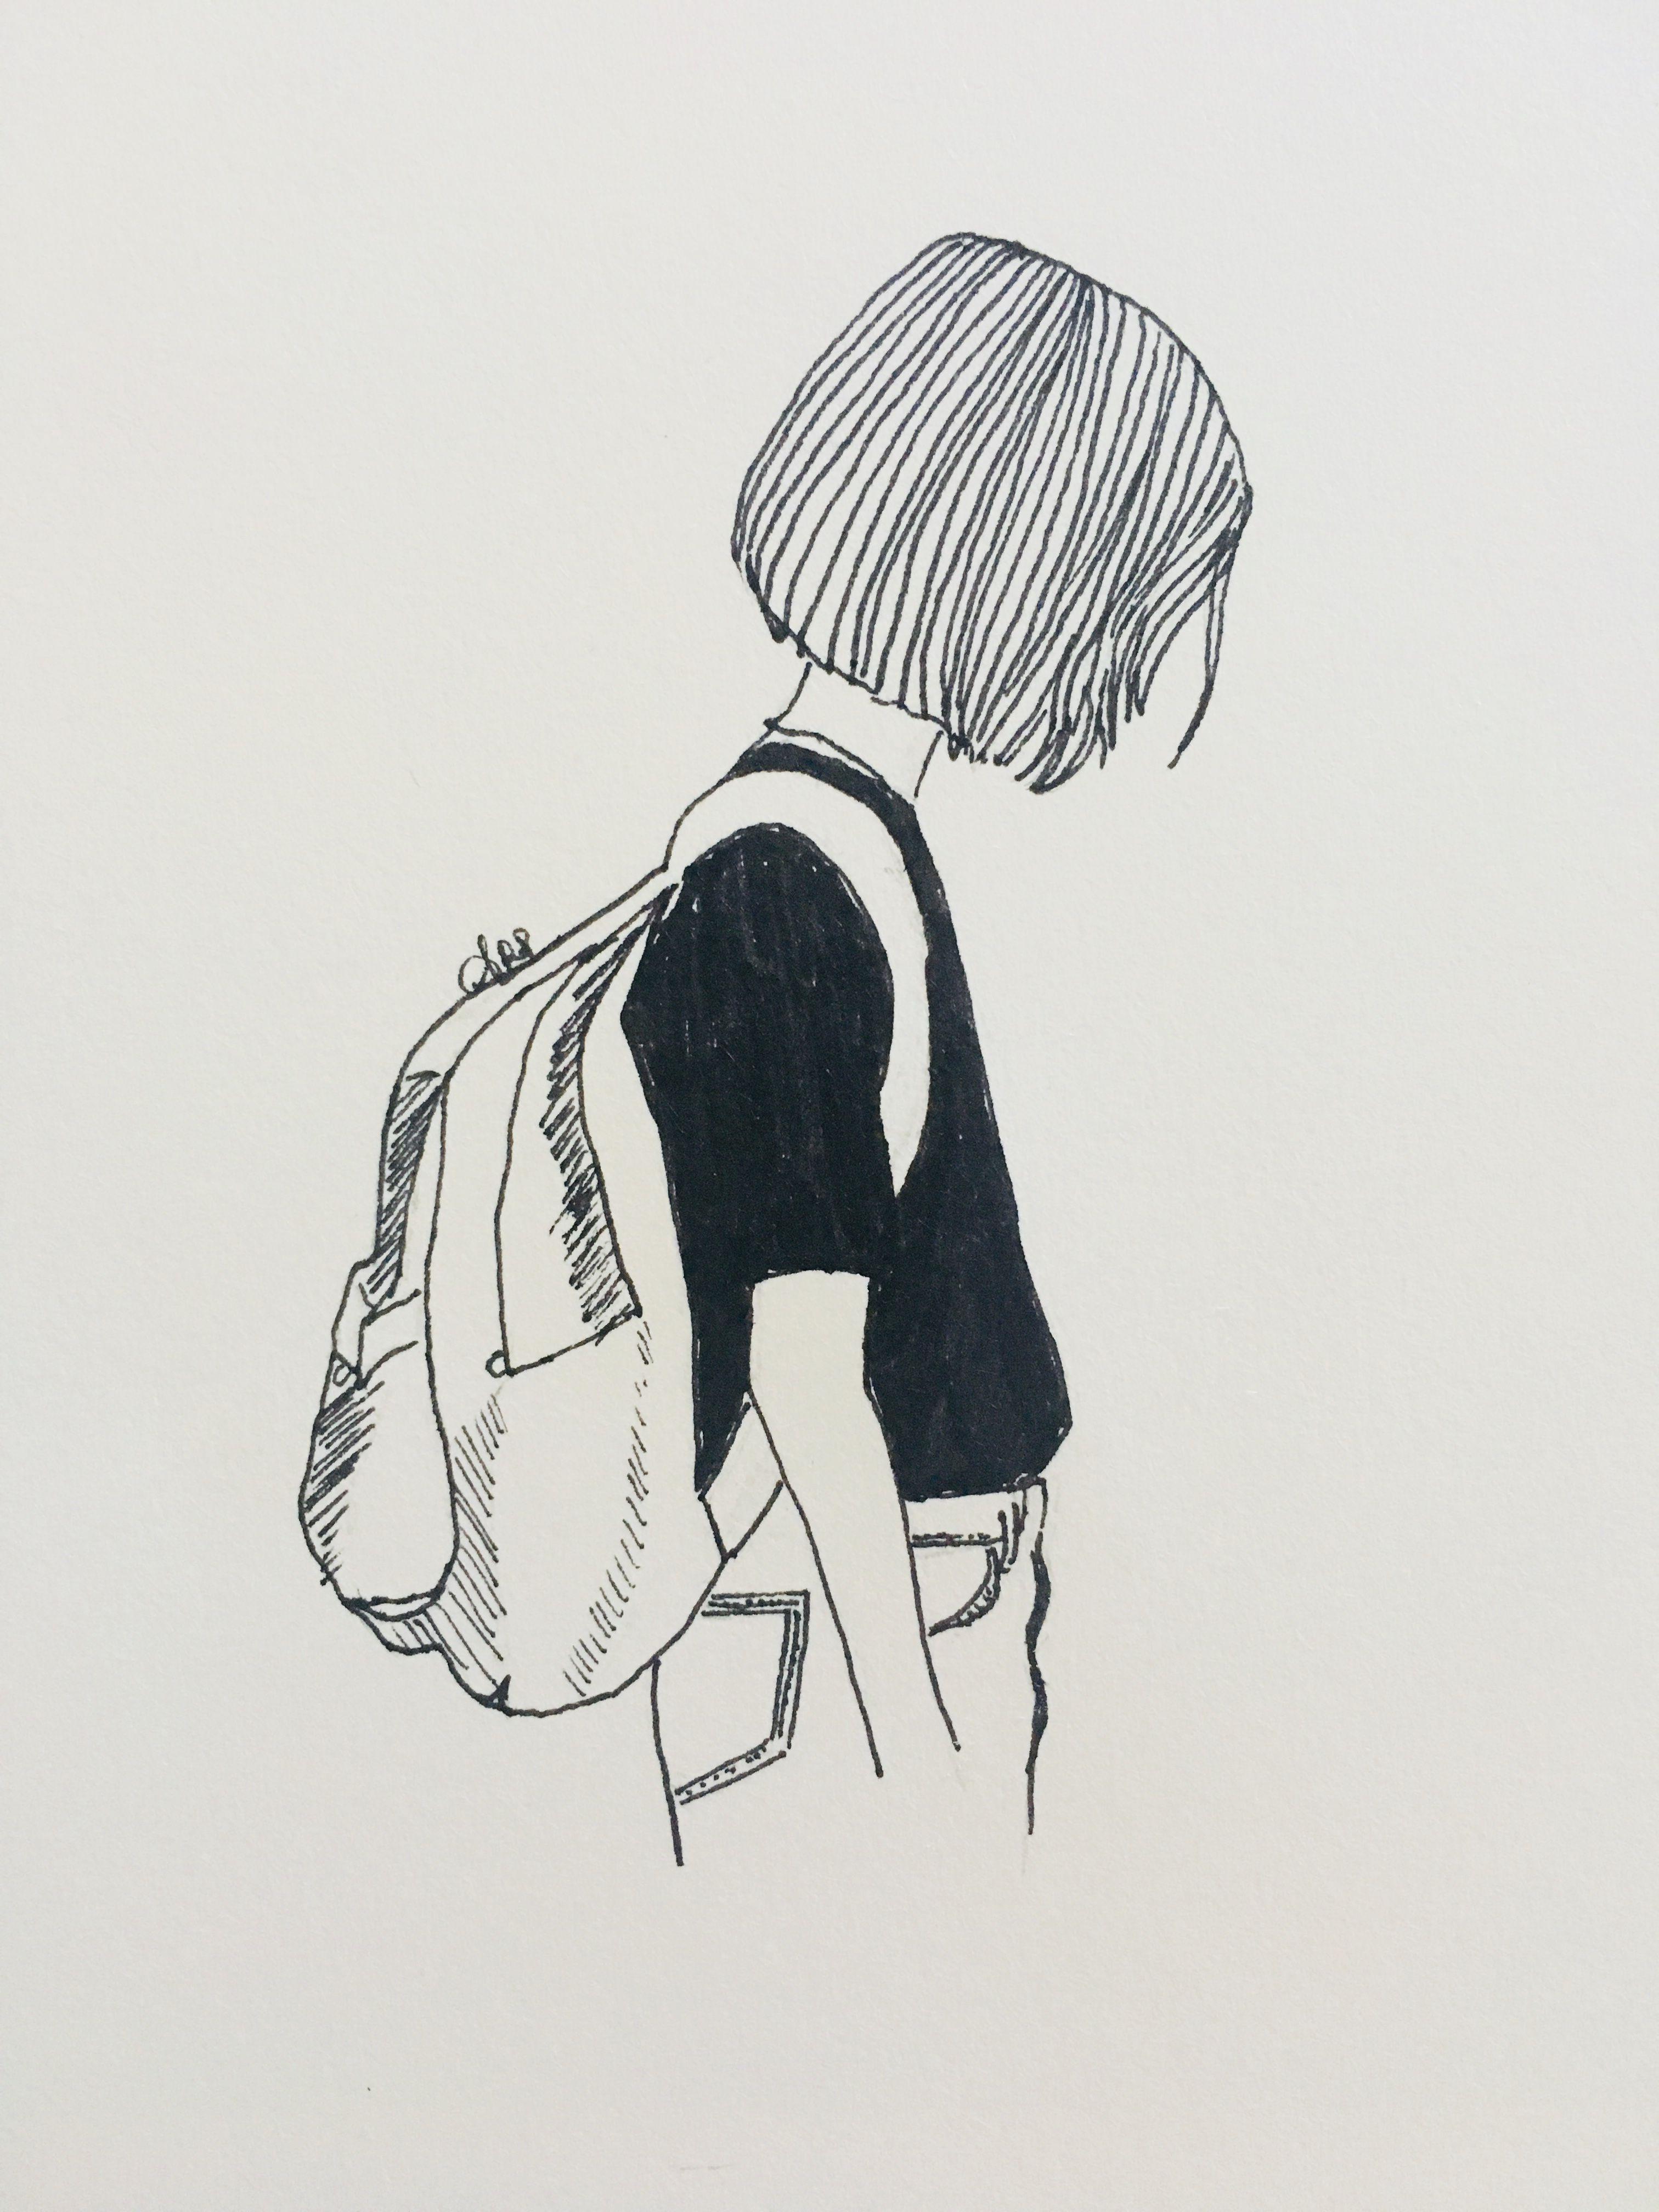 Doodle Aesthetic Drawings Easy